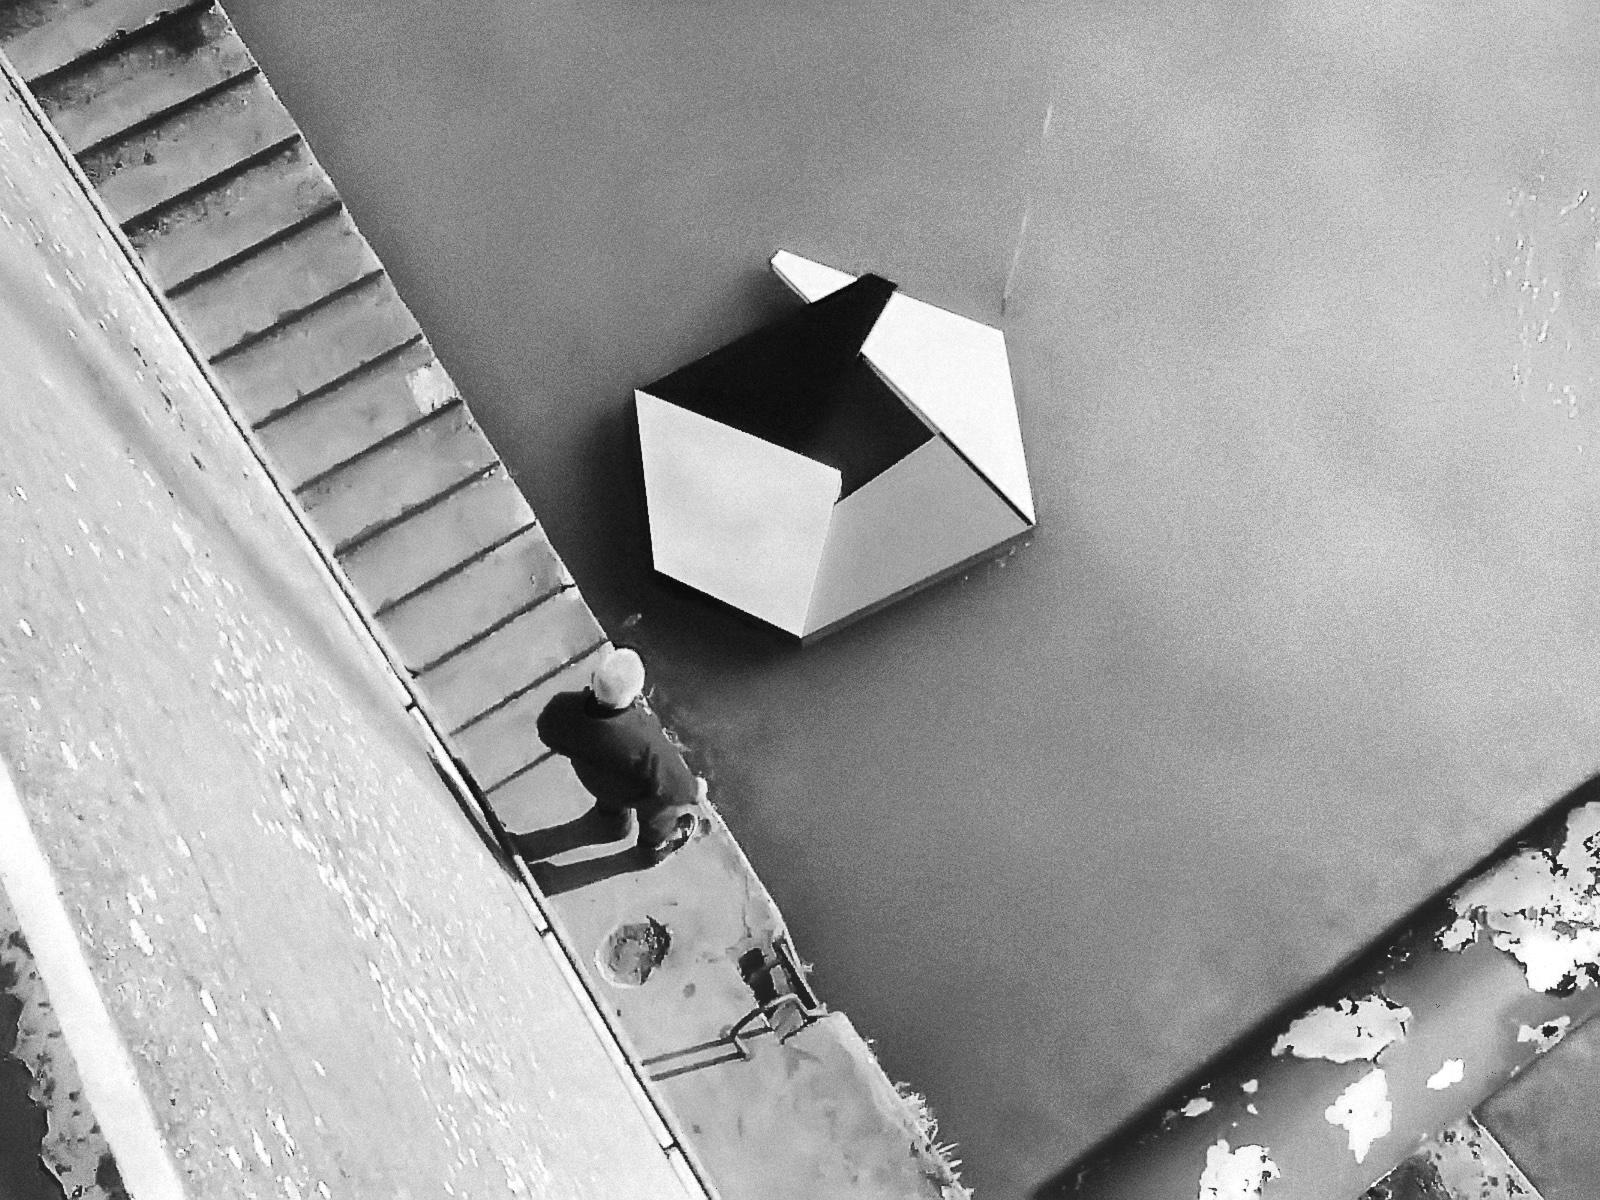 Visionäres Fragment für Antoine Cournot  Katja Strunz  Backdoor Fantasies KAi 10 Arthena Foundation.